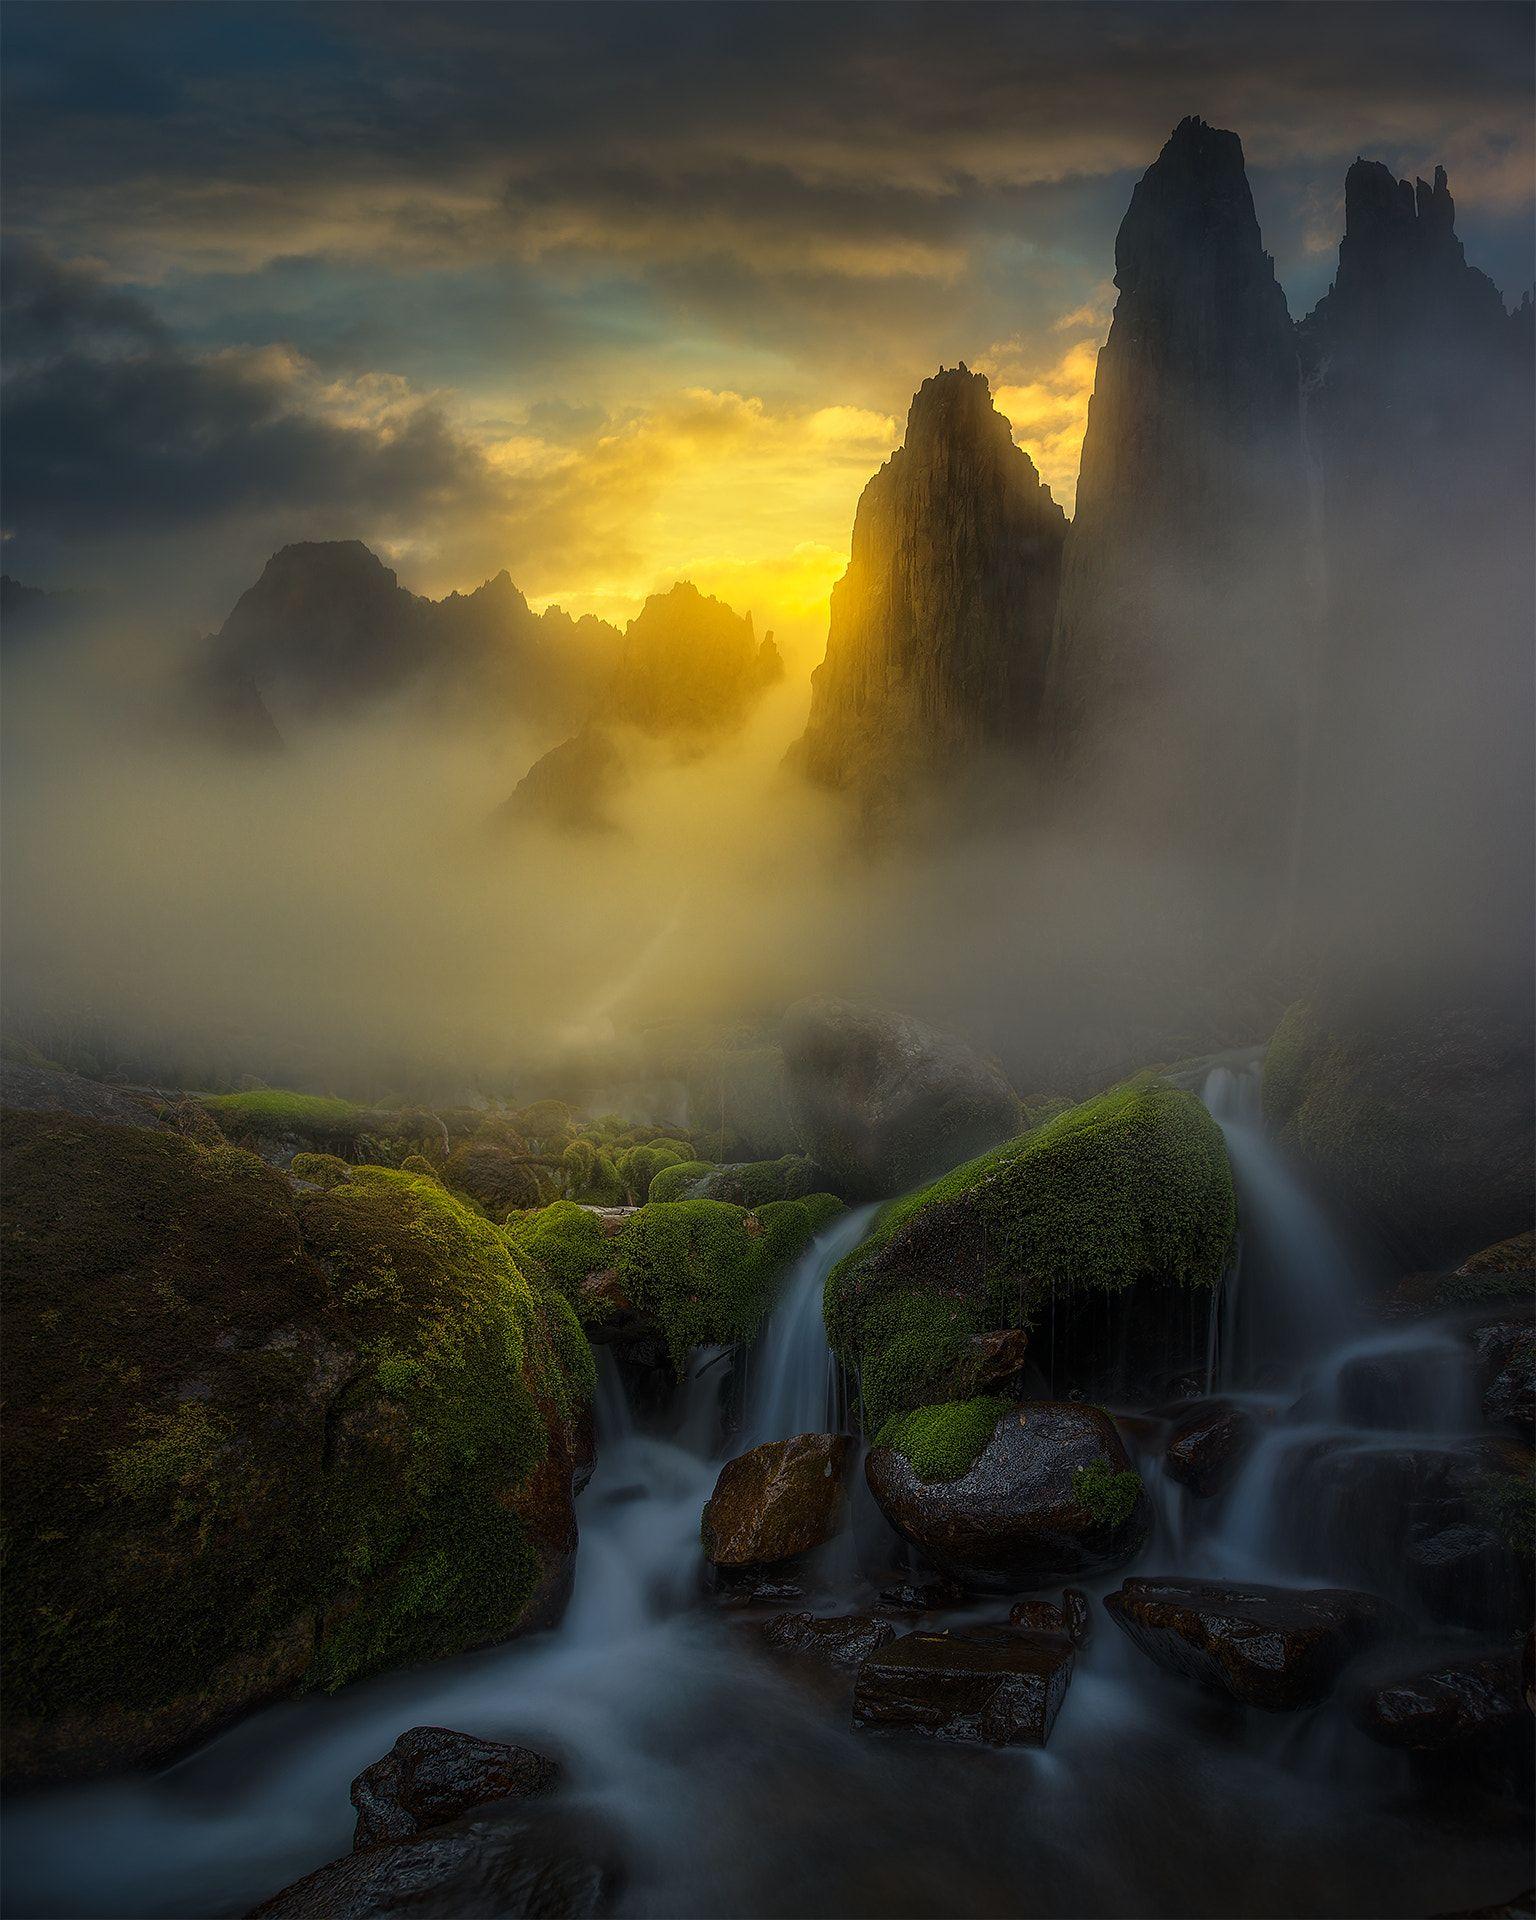 jhgghgh by sunrise dramaticsky sunset fog 1536x1920